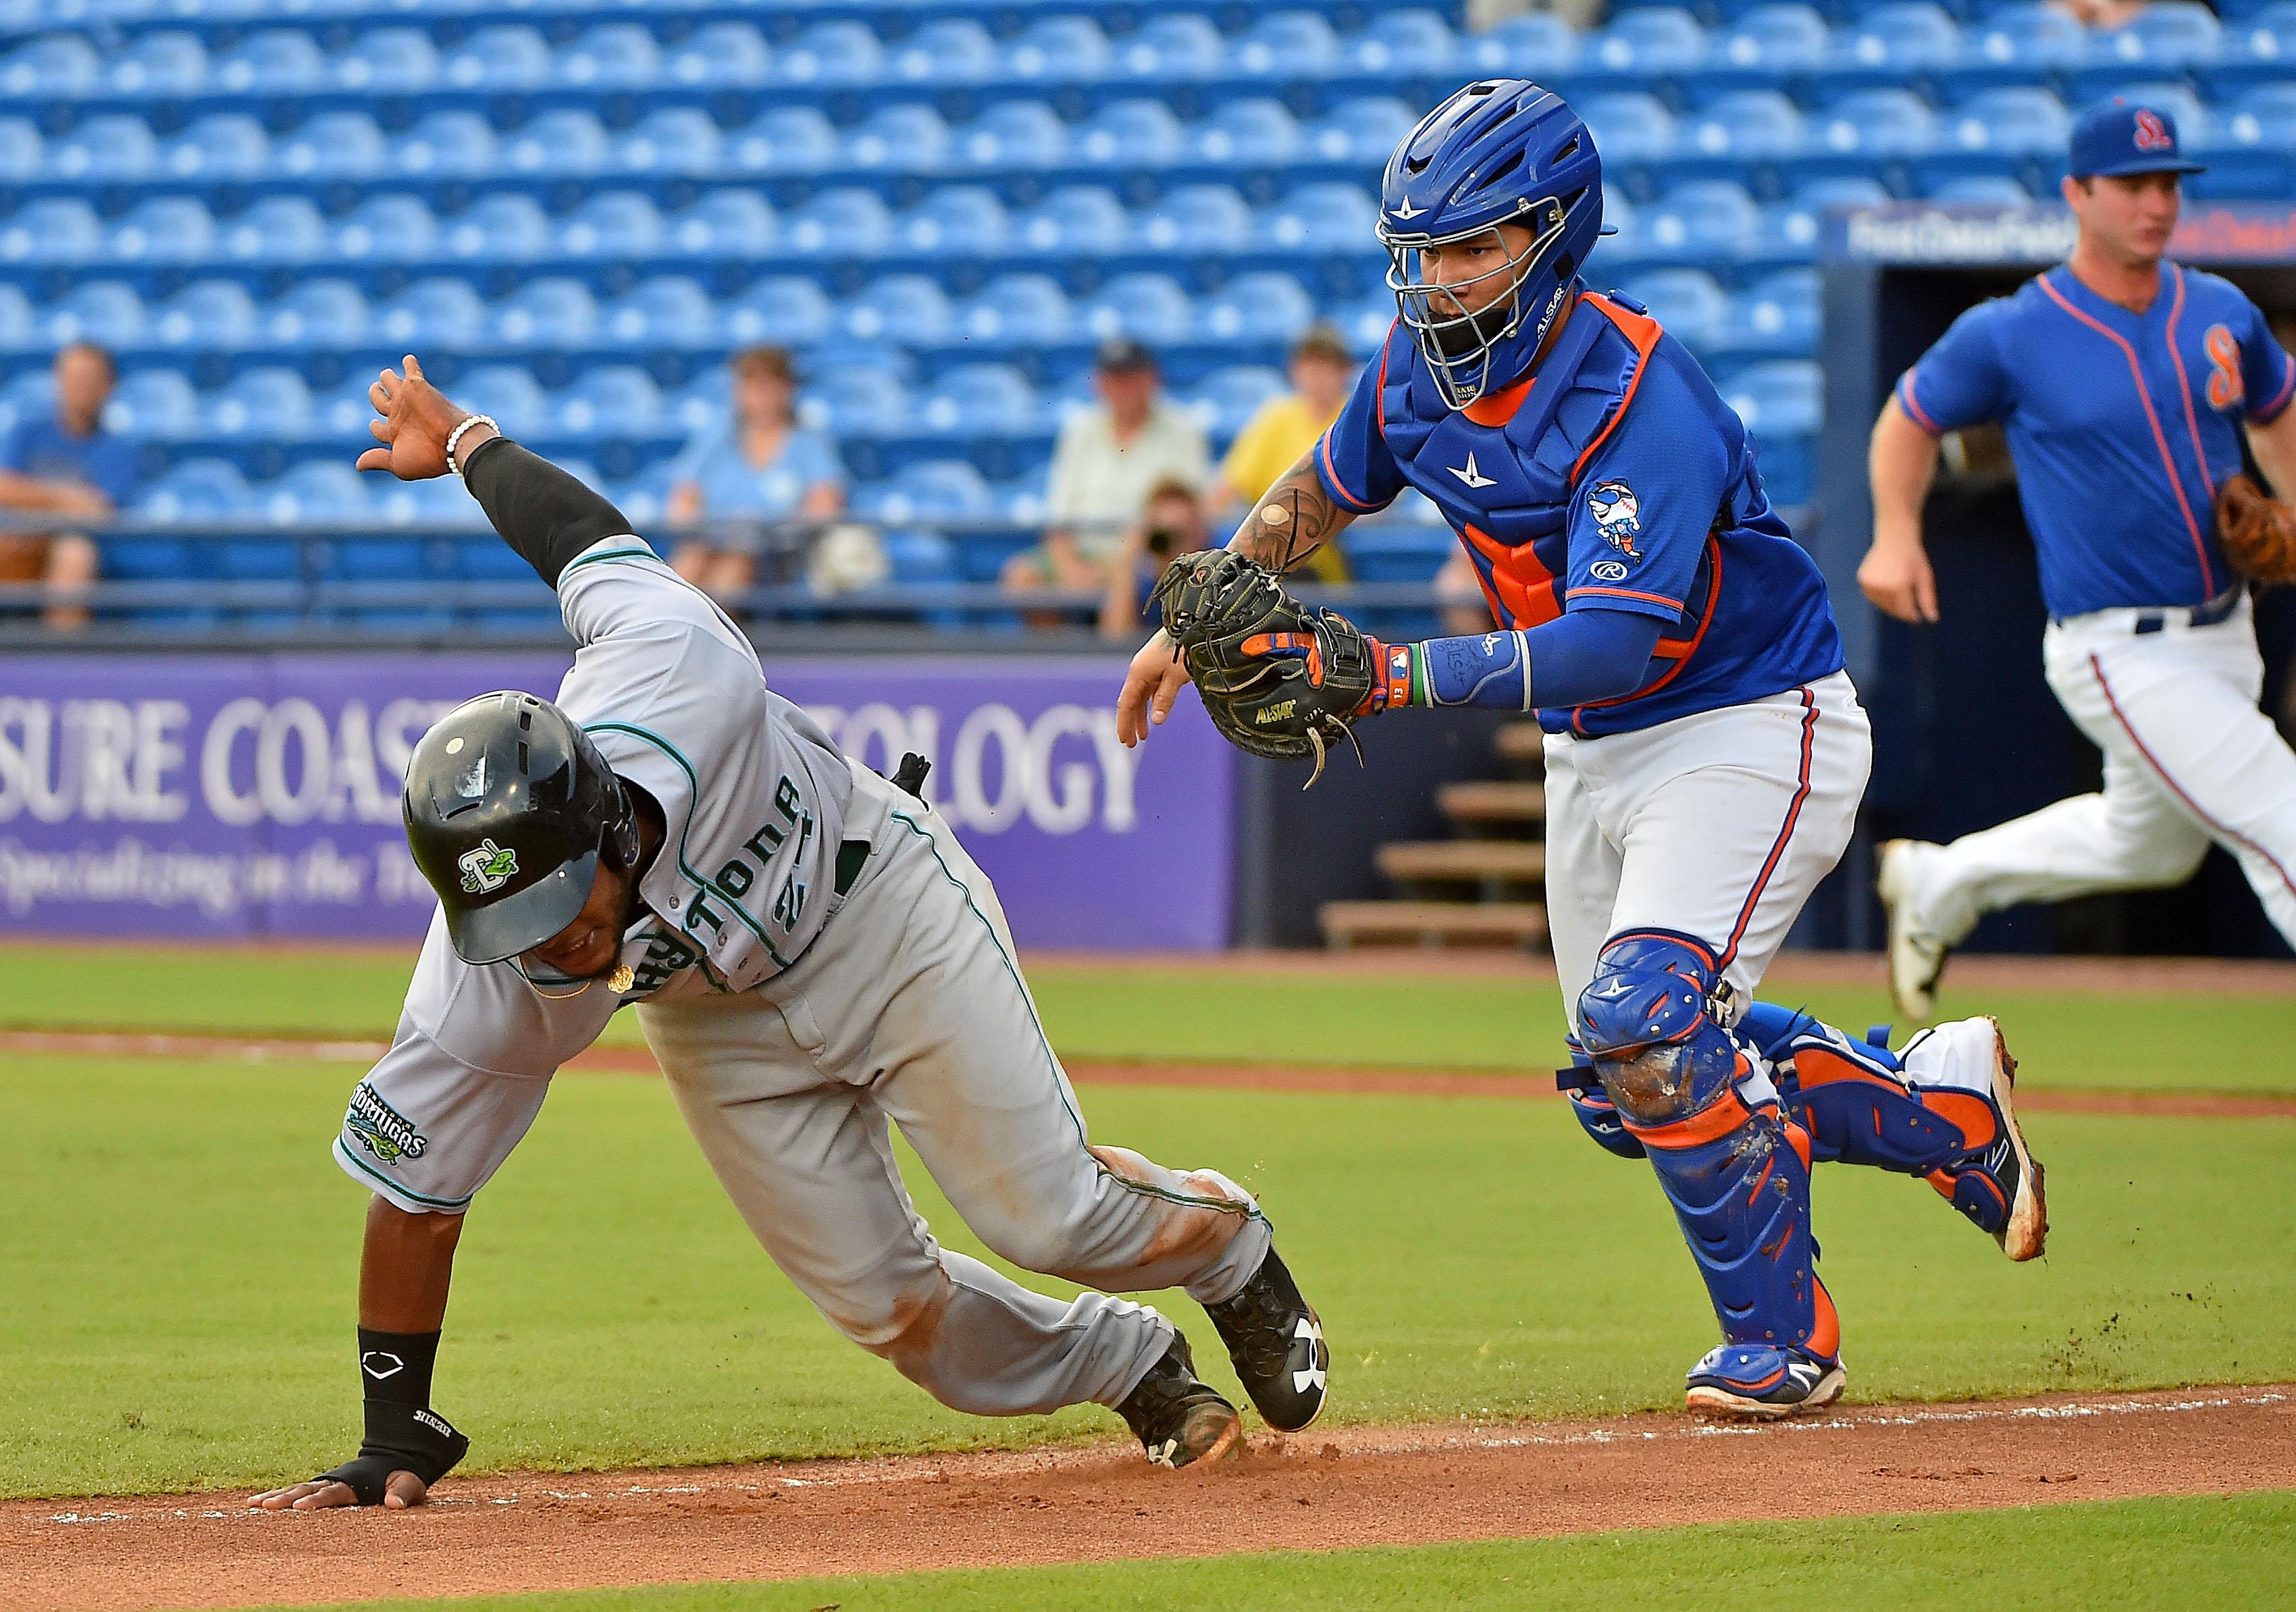 Minor League Baseball: Daytona Tortugas at Port St. Lucie Mets